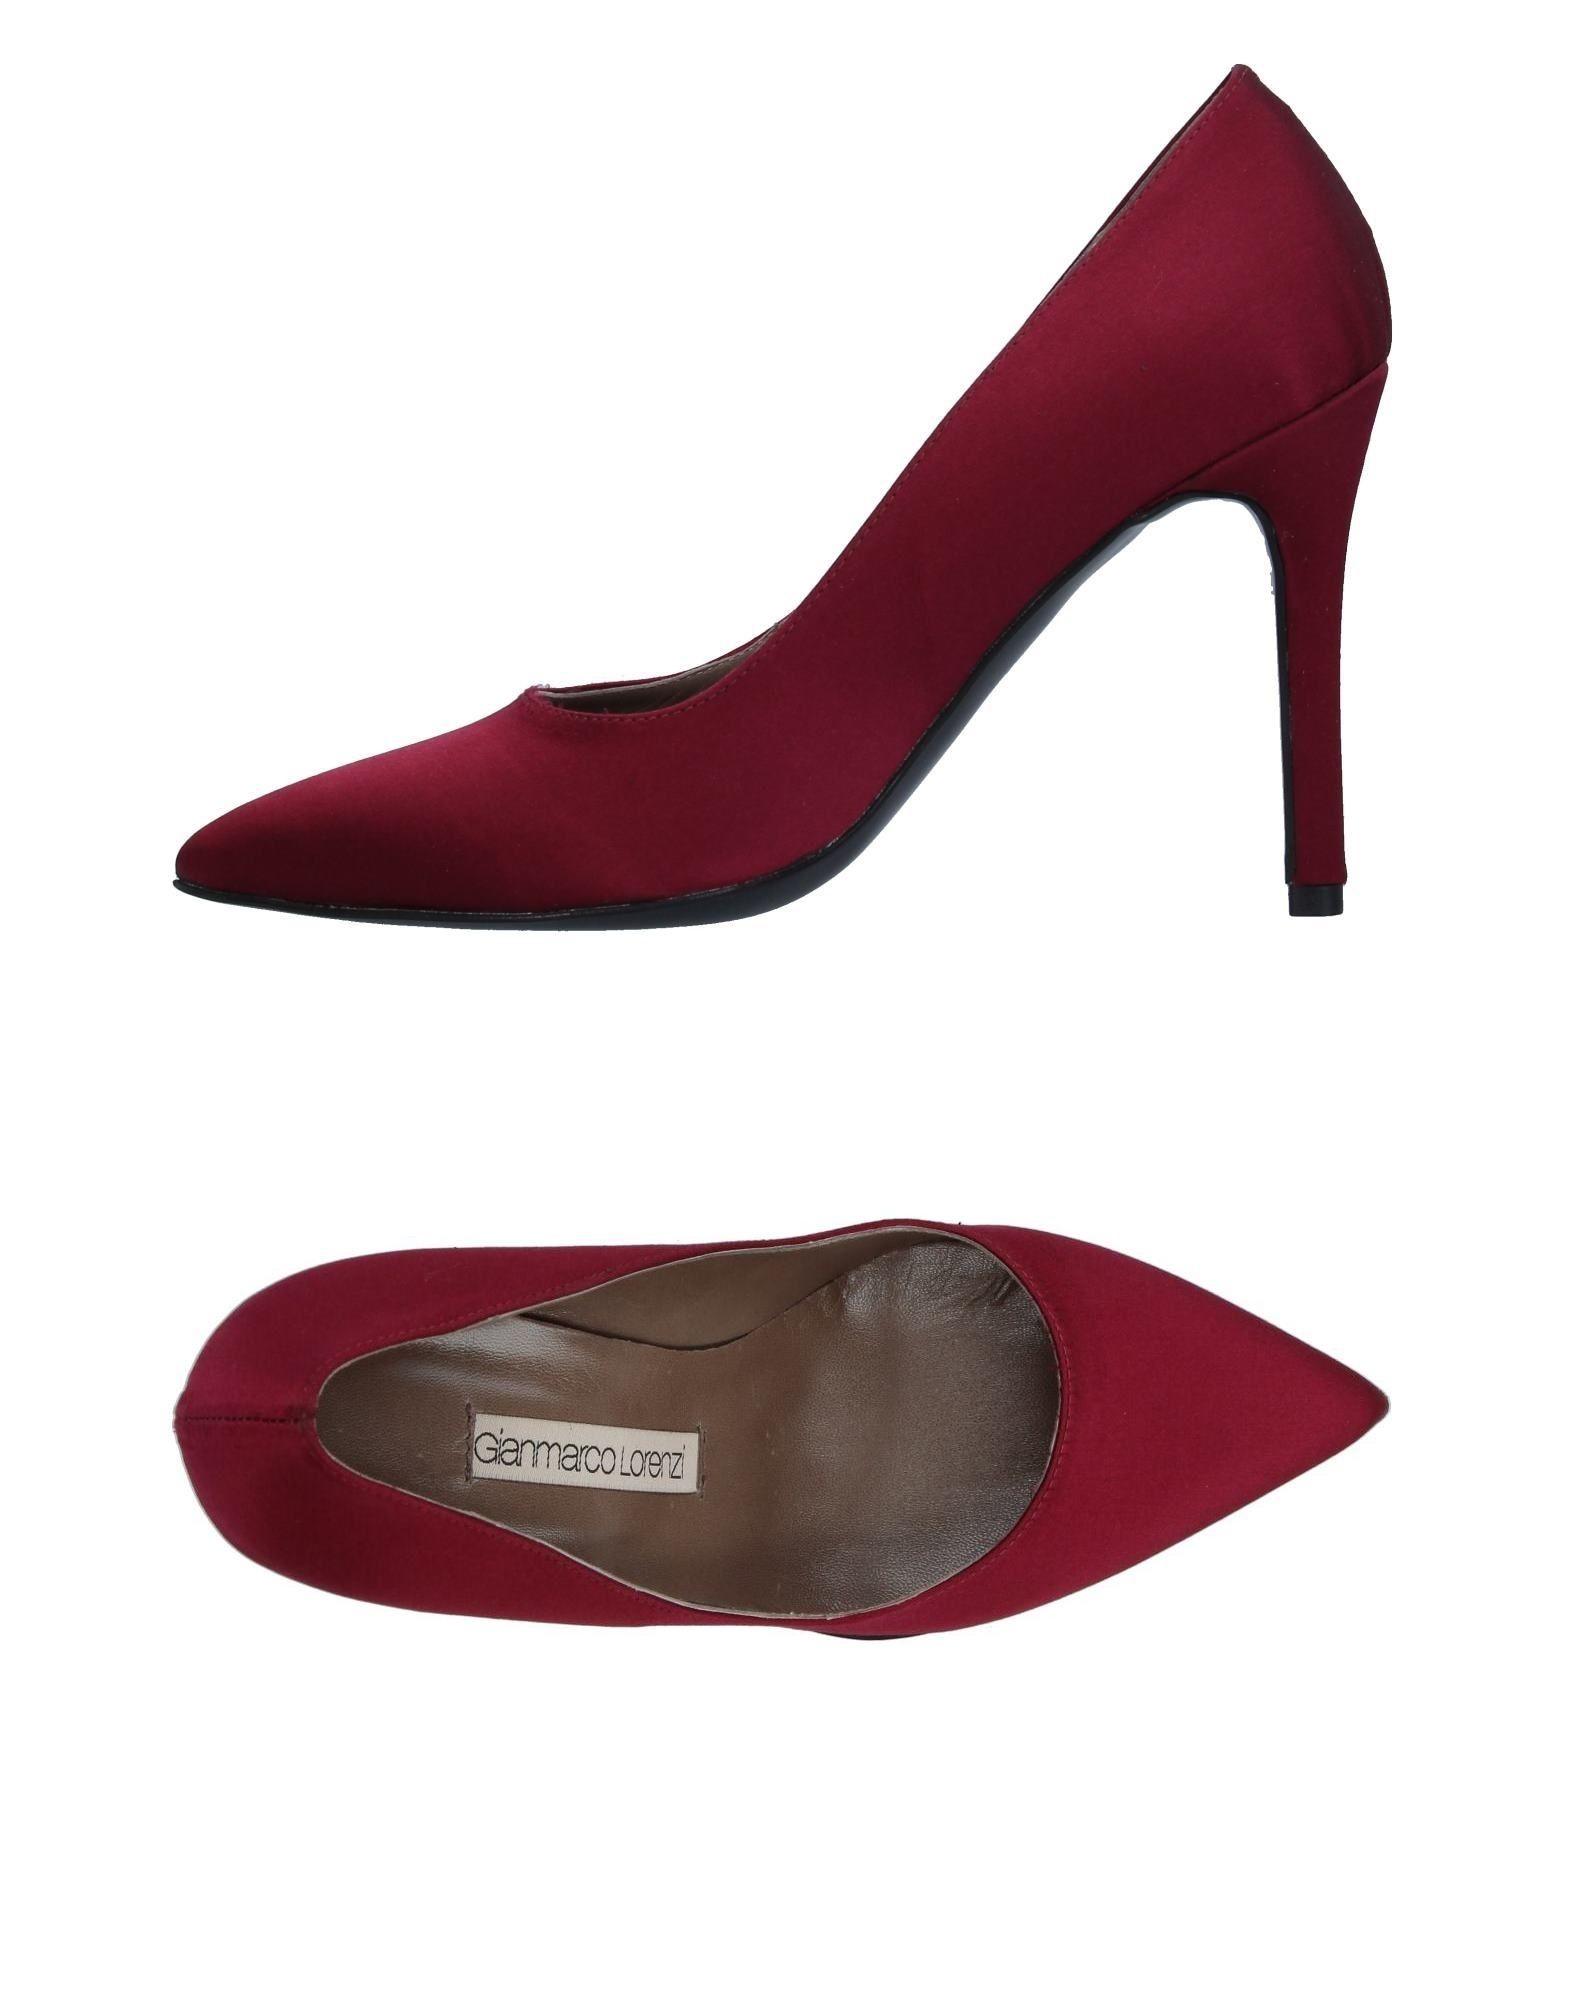 Gianmarco Lorenzi Pumps Damen  11332513HX Gute Qualität beliebte Schuhe